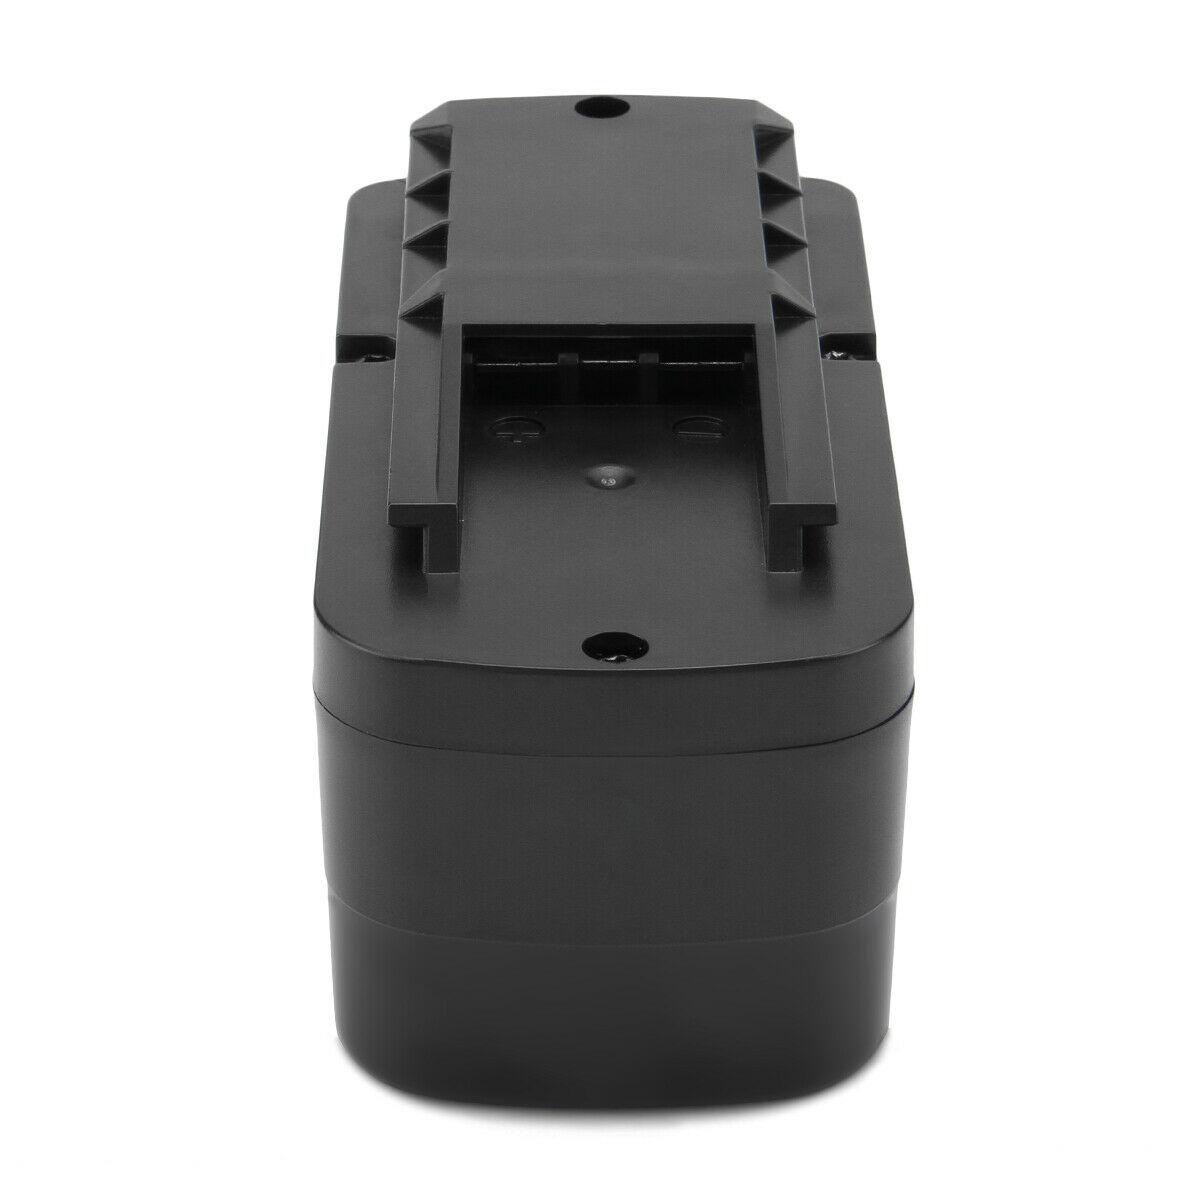 Batterie BPS 12 C BPS 12 S Festool C 12 , C 12 DUO, C 12 LI 12V(compatible)